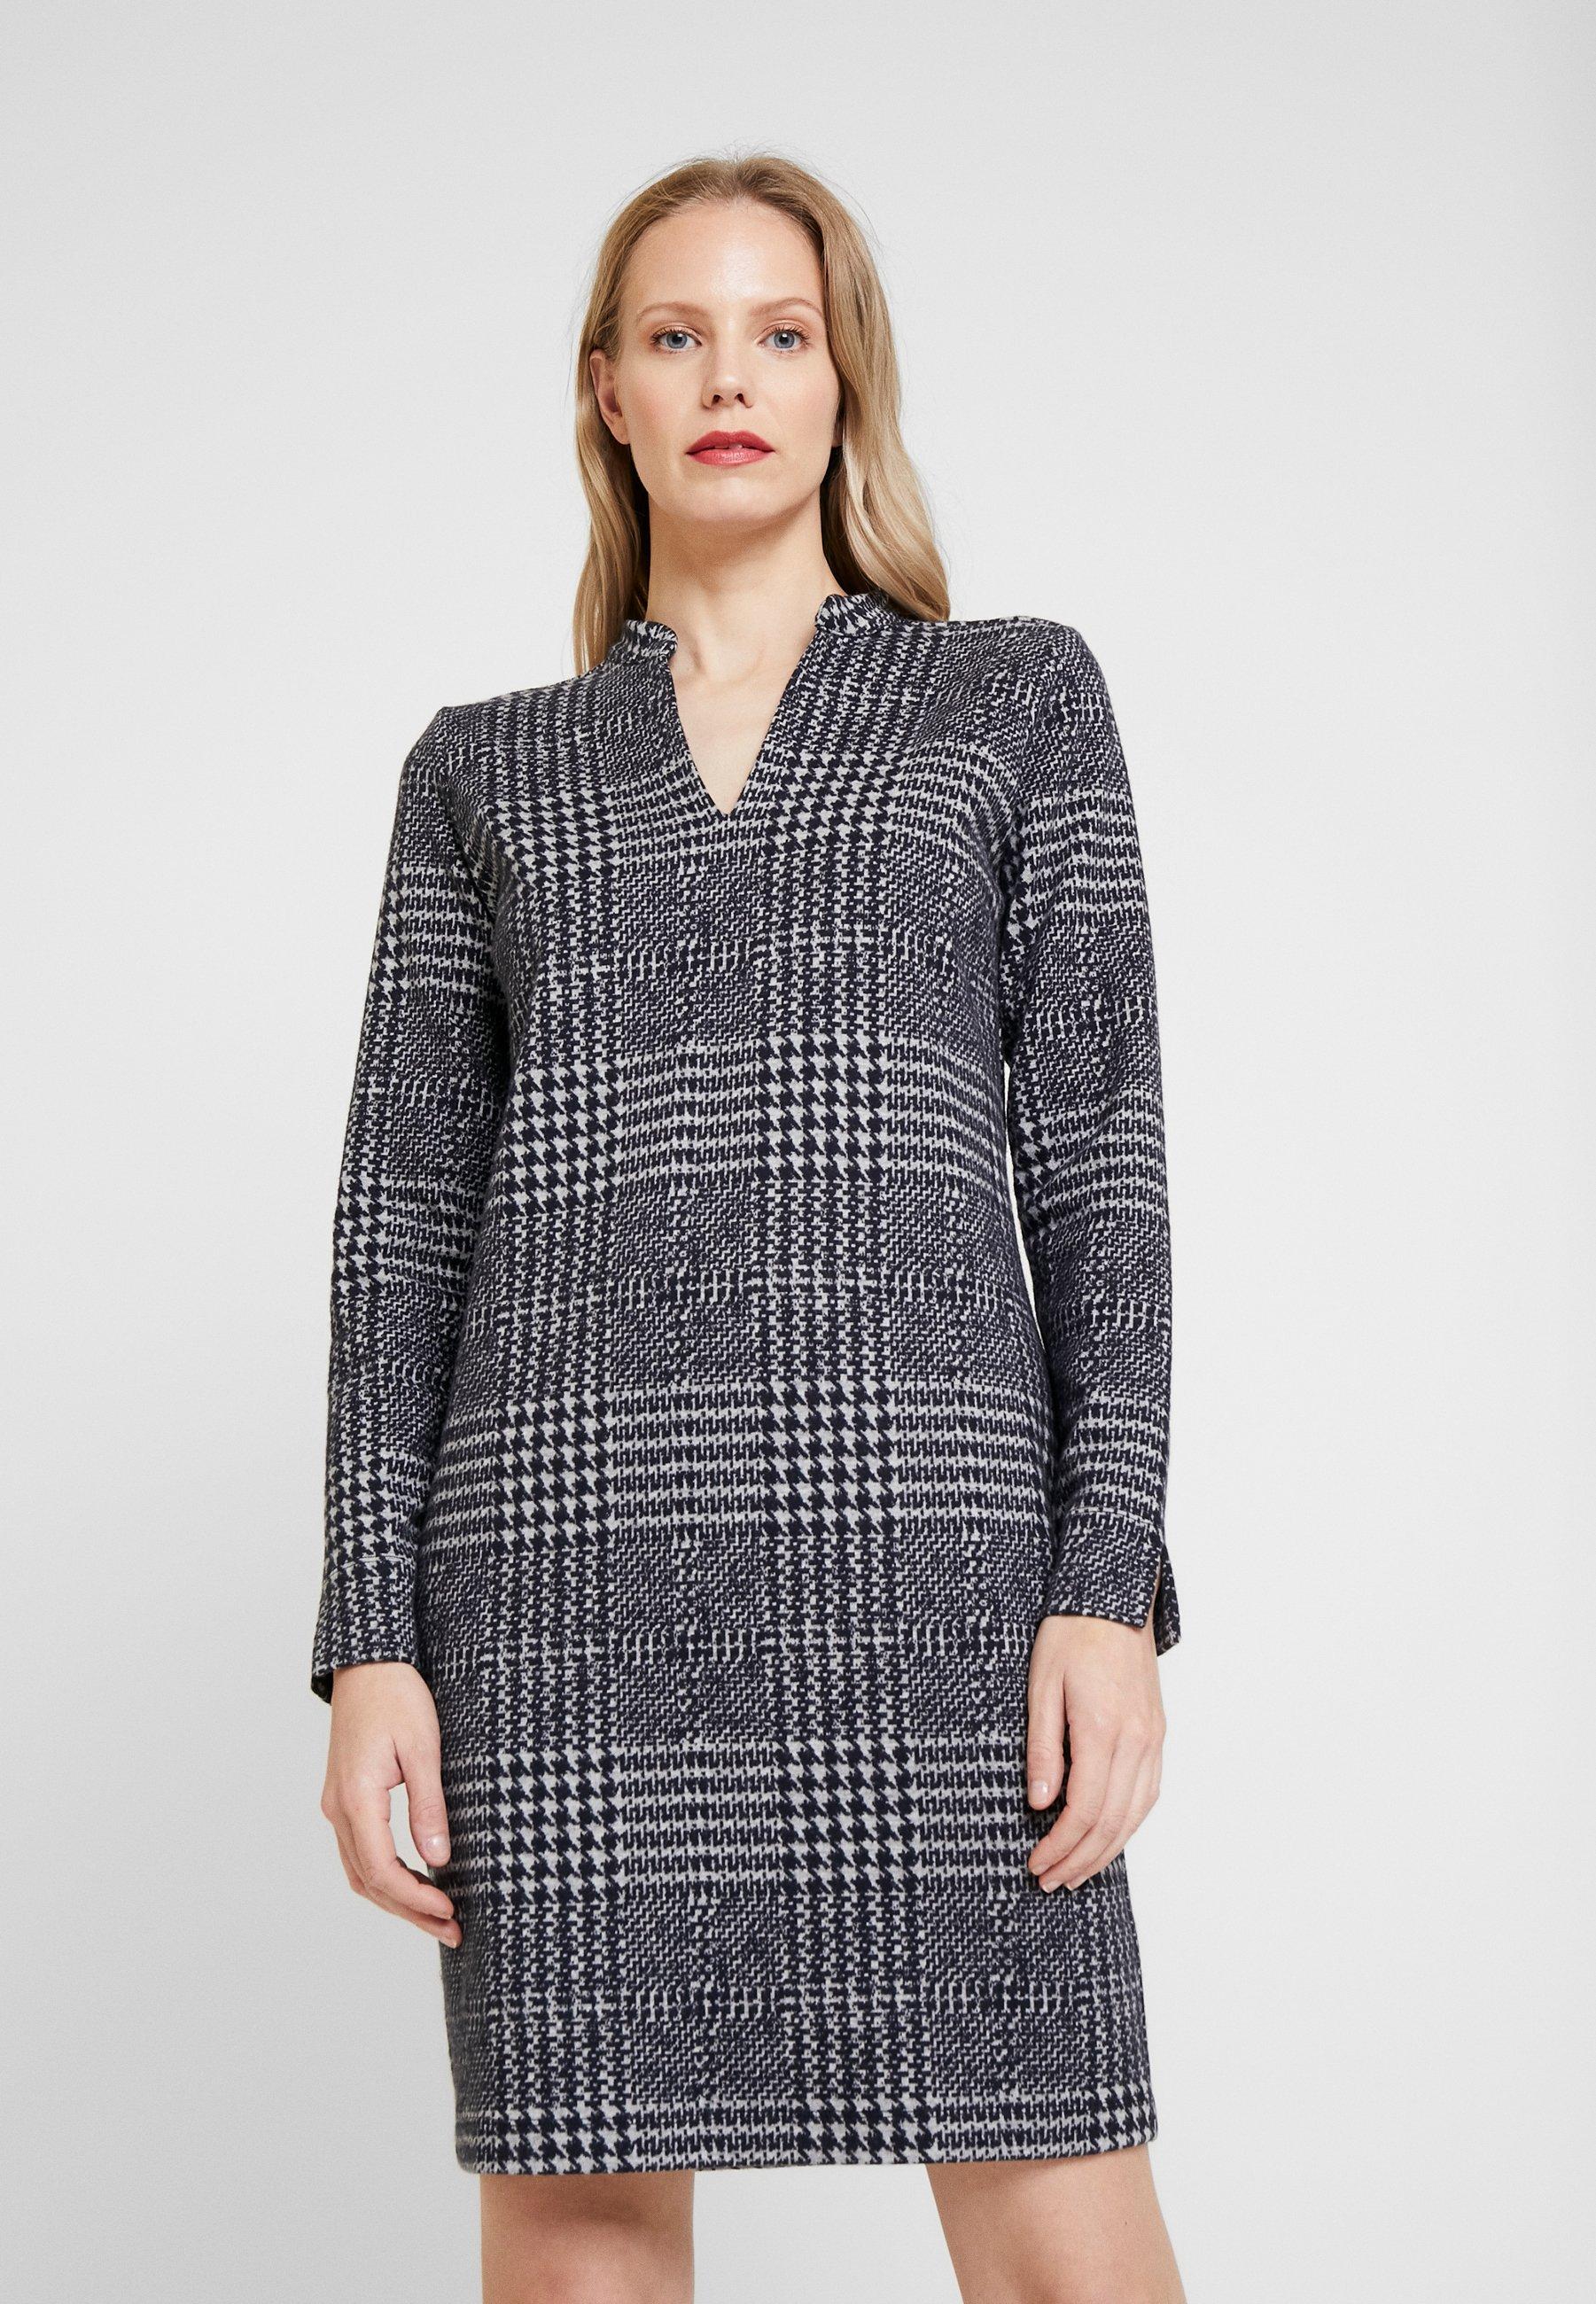 Josephine & Co AYDEN DRESS - Abito in maglia navy